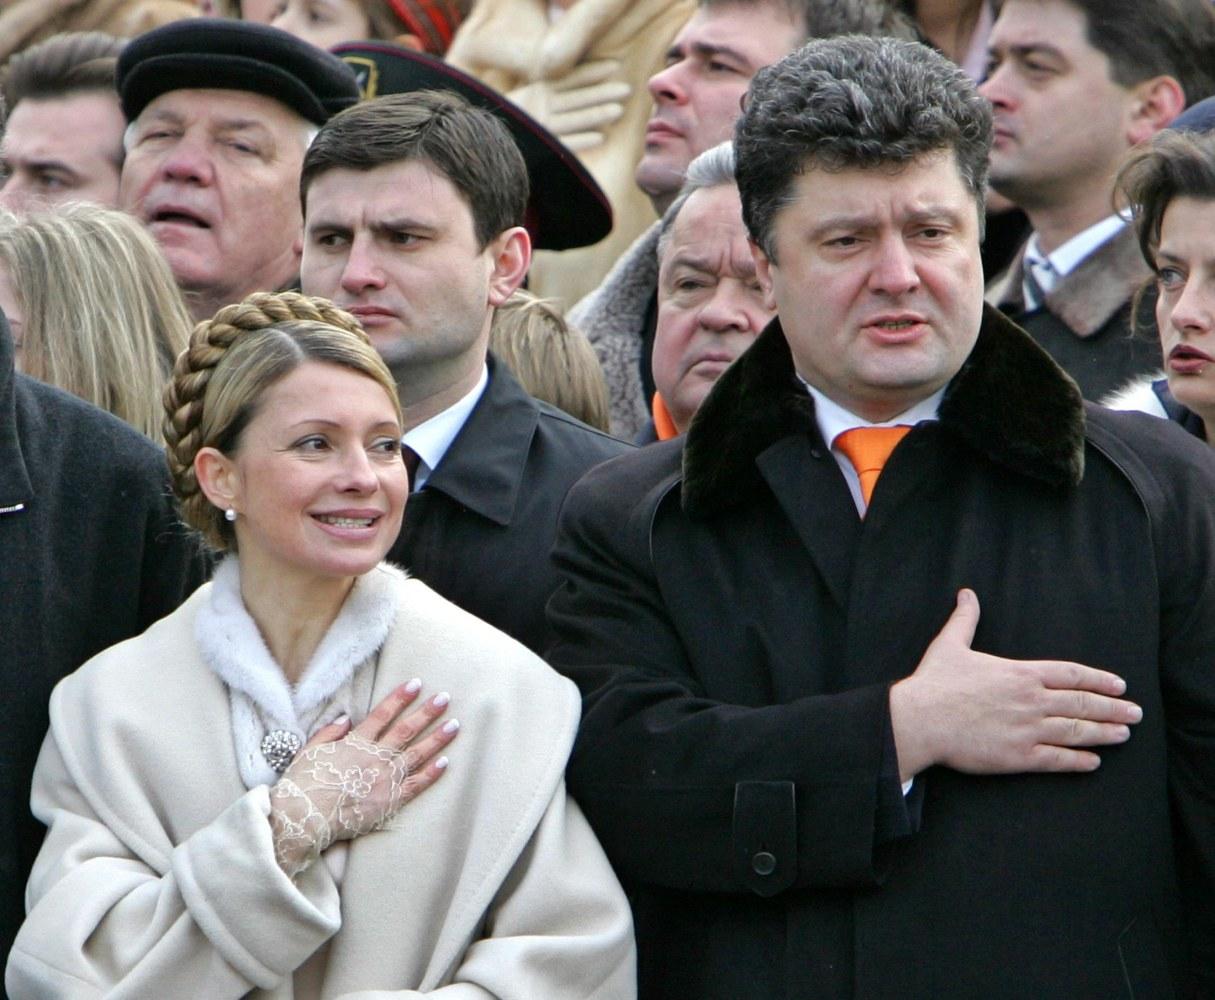 Will the 'Chocolate King' Be Ukraine's Next President? - NBC News